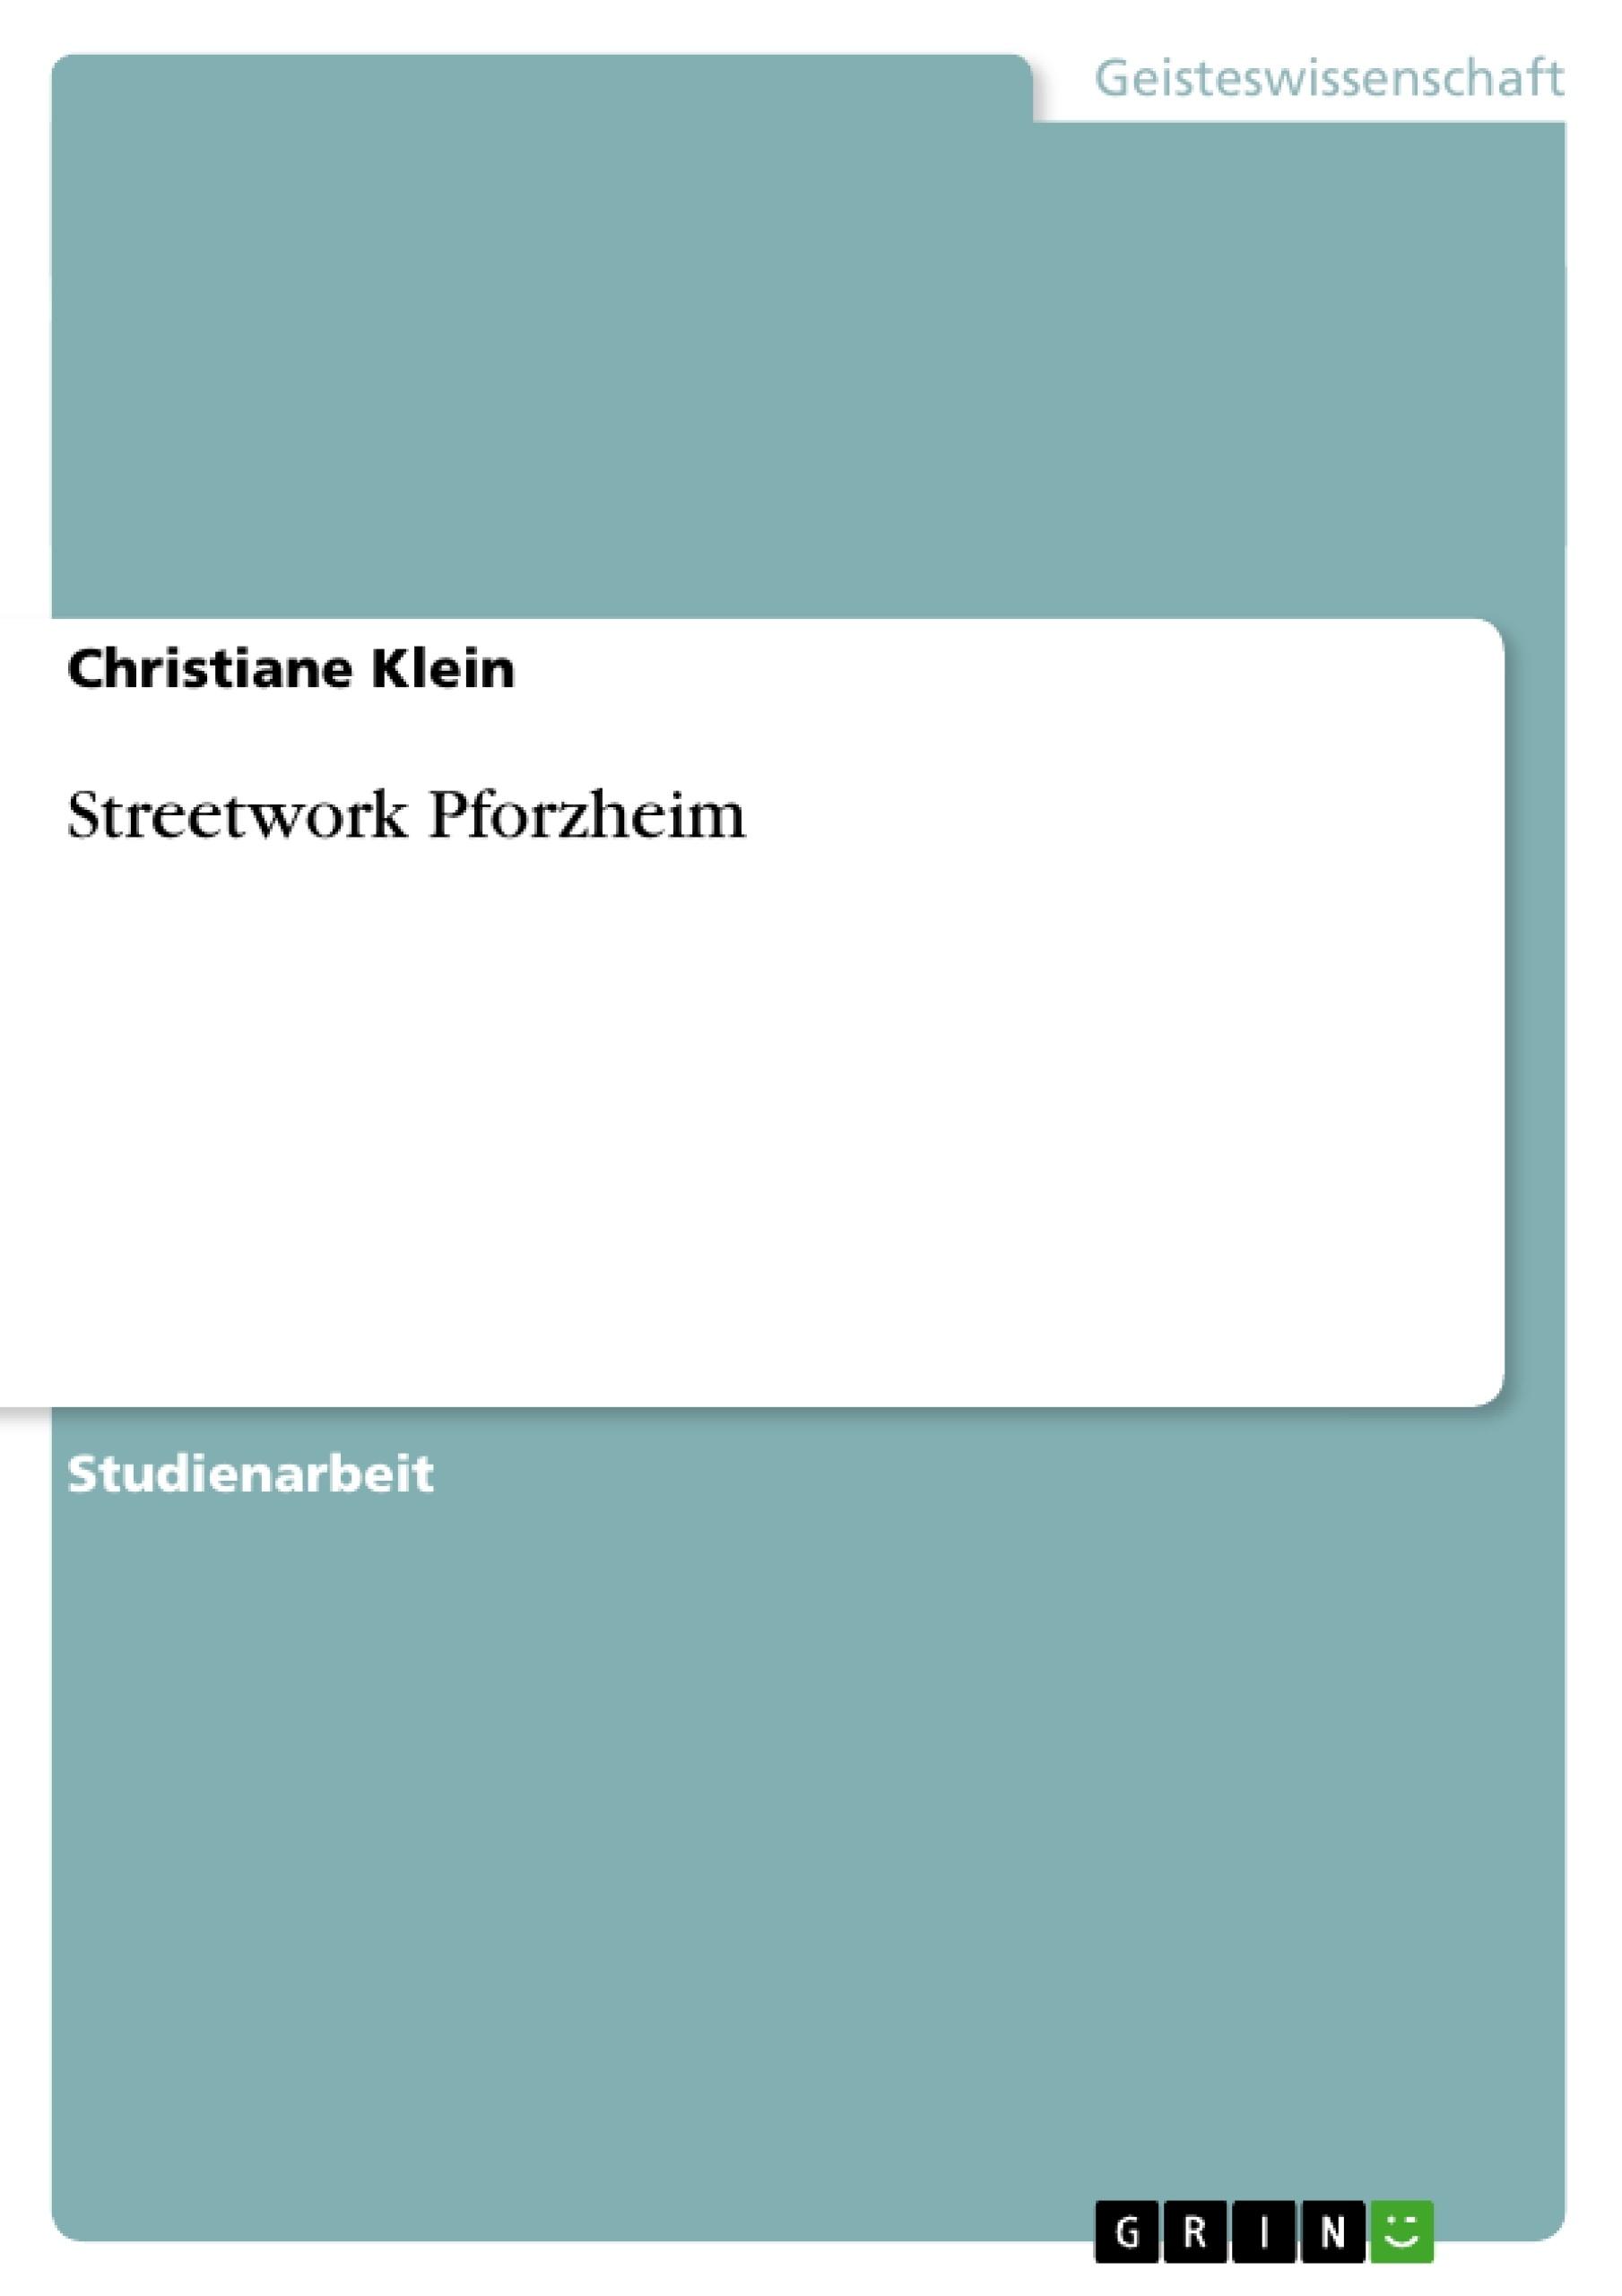 Titel: Streetwork Pforzheim